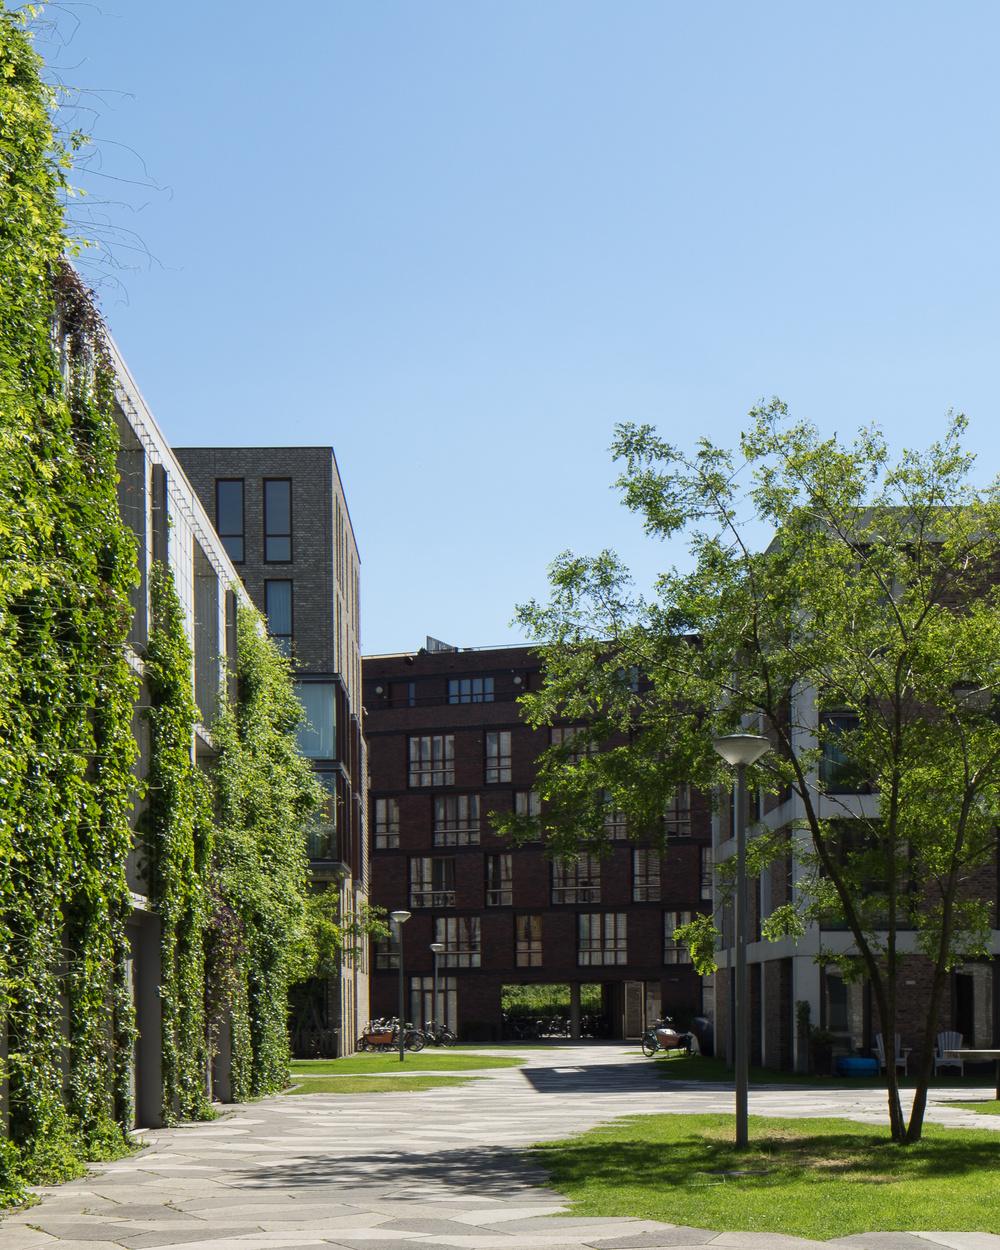 amsterdam-modern-architecture-facade-het-funen-mark-hadden-photography-architectuurfotograaf-091.jpg